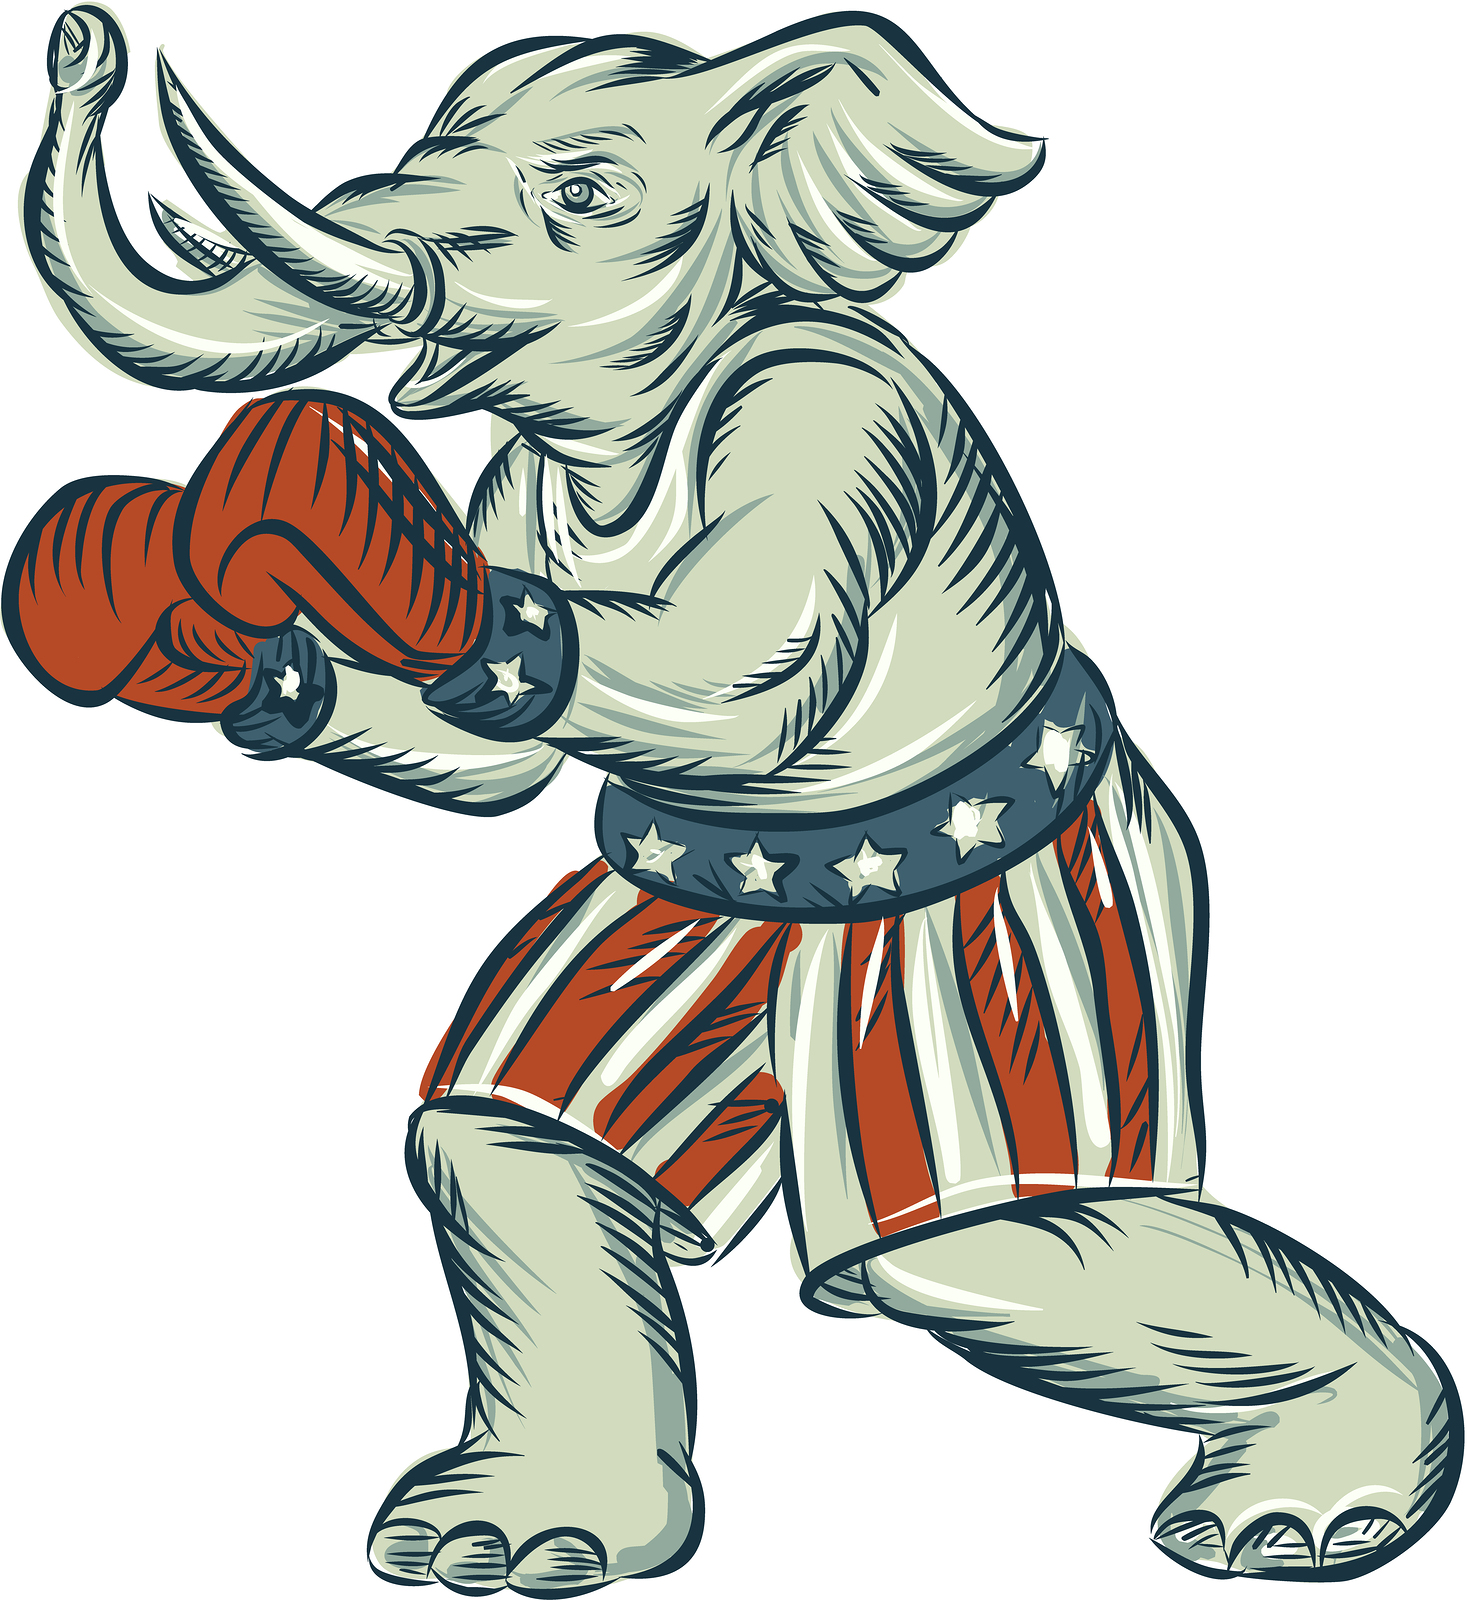 bigstock-Republican-Elephant-Boxer-Masc-100443809.jpg